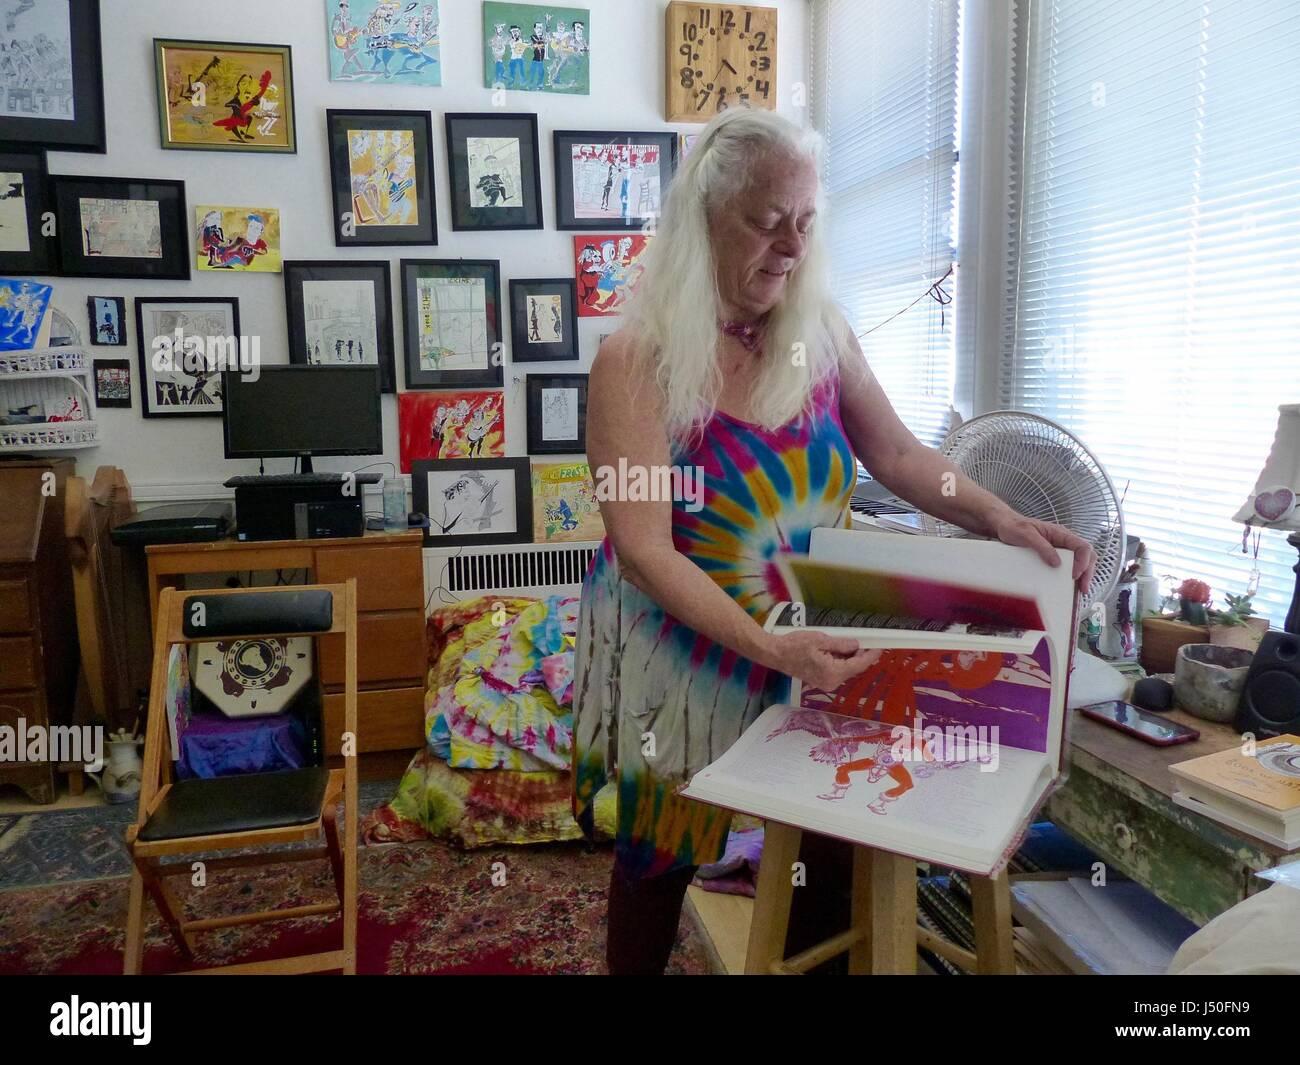 North Beach, San Francisco, USA. 1st May, 2017. Hippie artist Ann Cohen leafs through an art book in her apartment - Stock Image